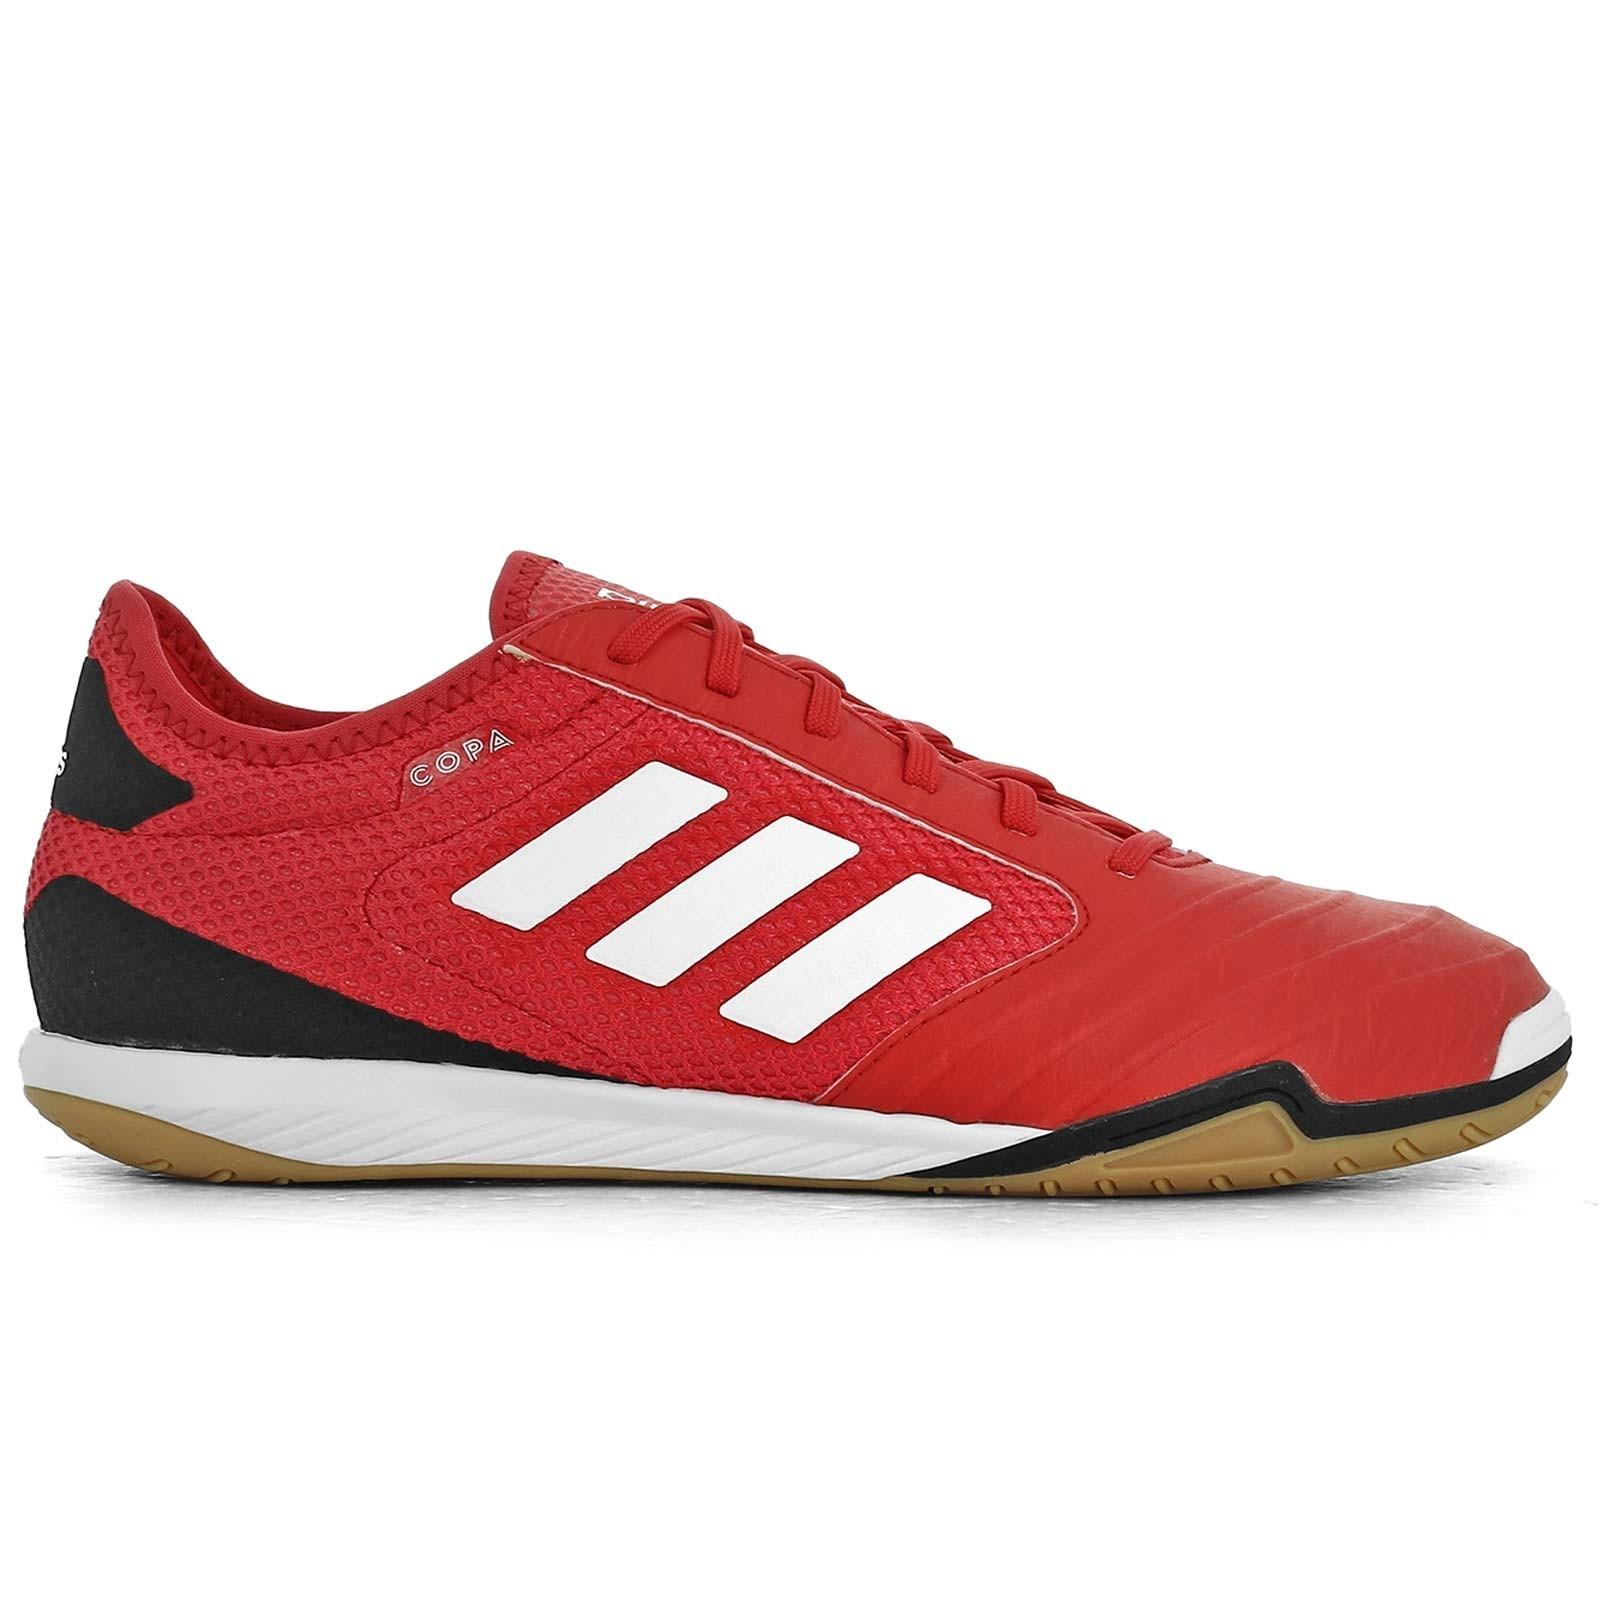 b8950f22def5f Zapatillas Fútbol Sala adidas Copa Tango 18.3 B22509 - Deportes Manzanedo